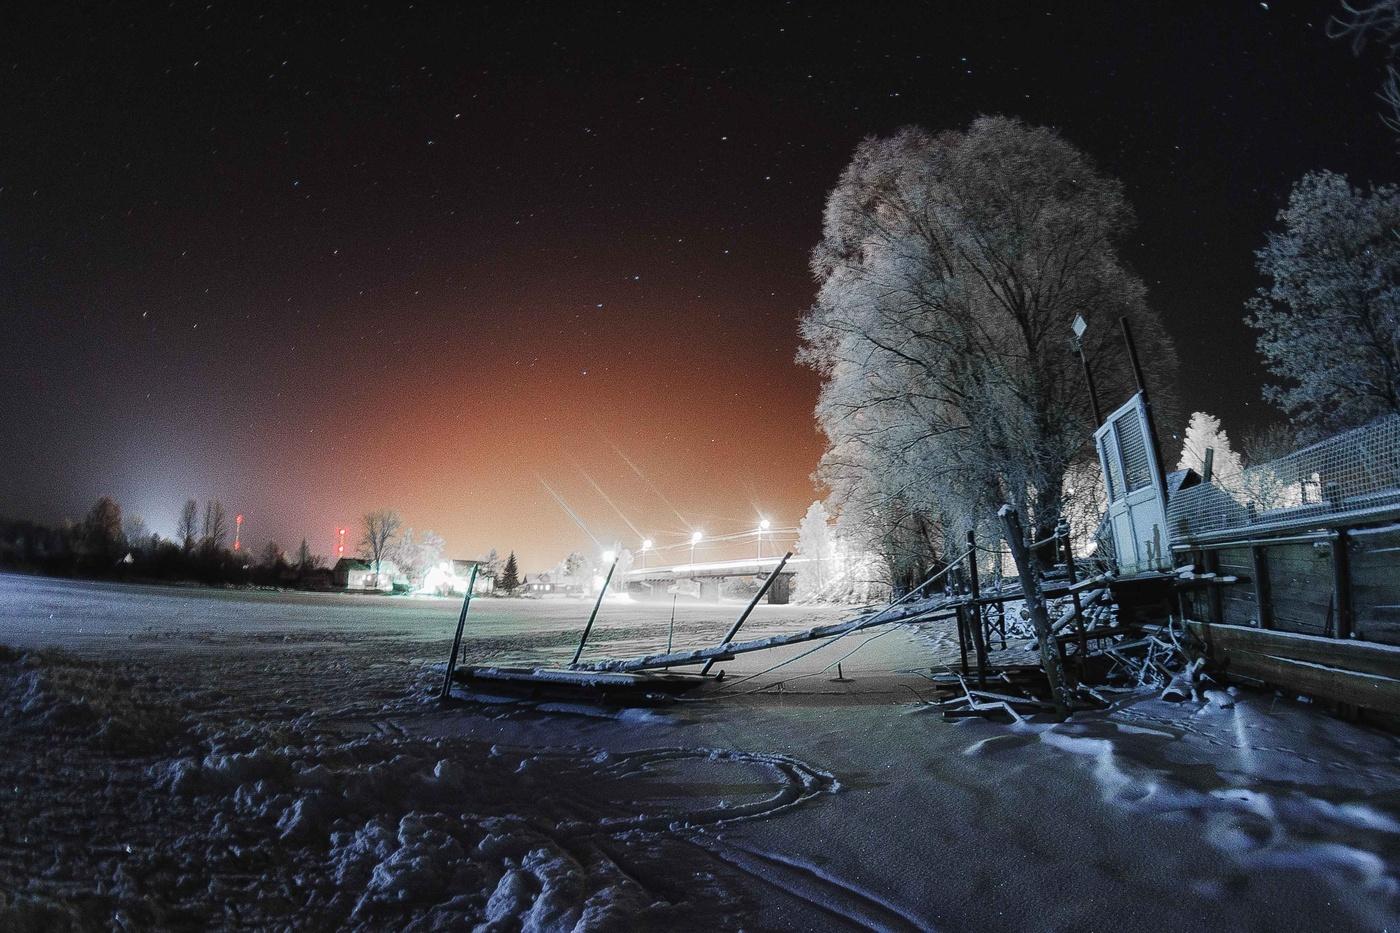 Мороз картинки ночью